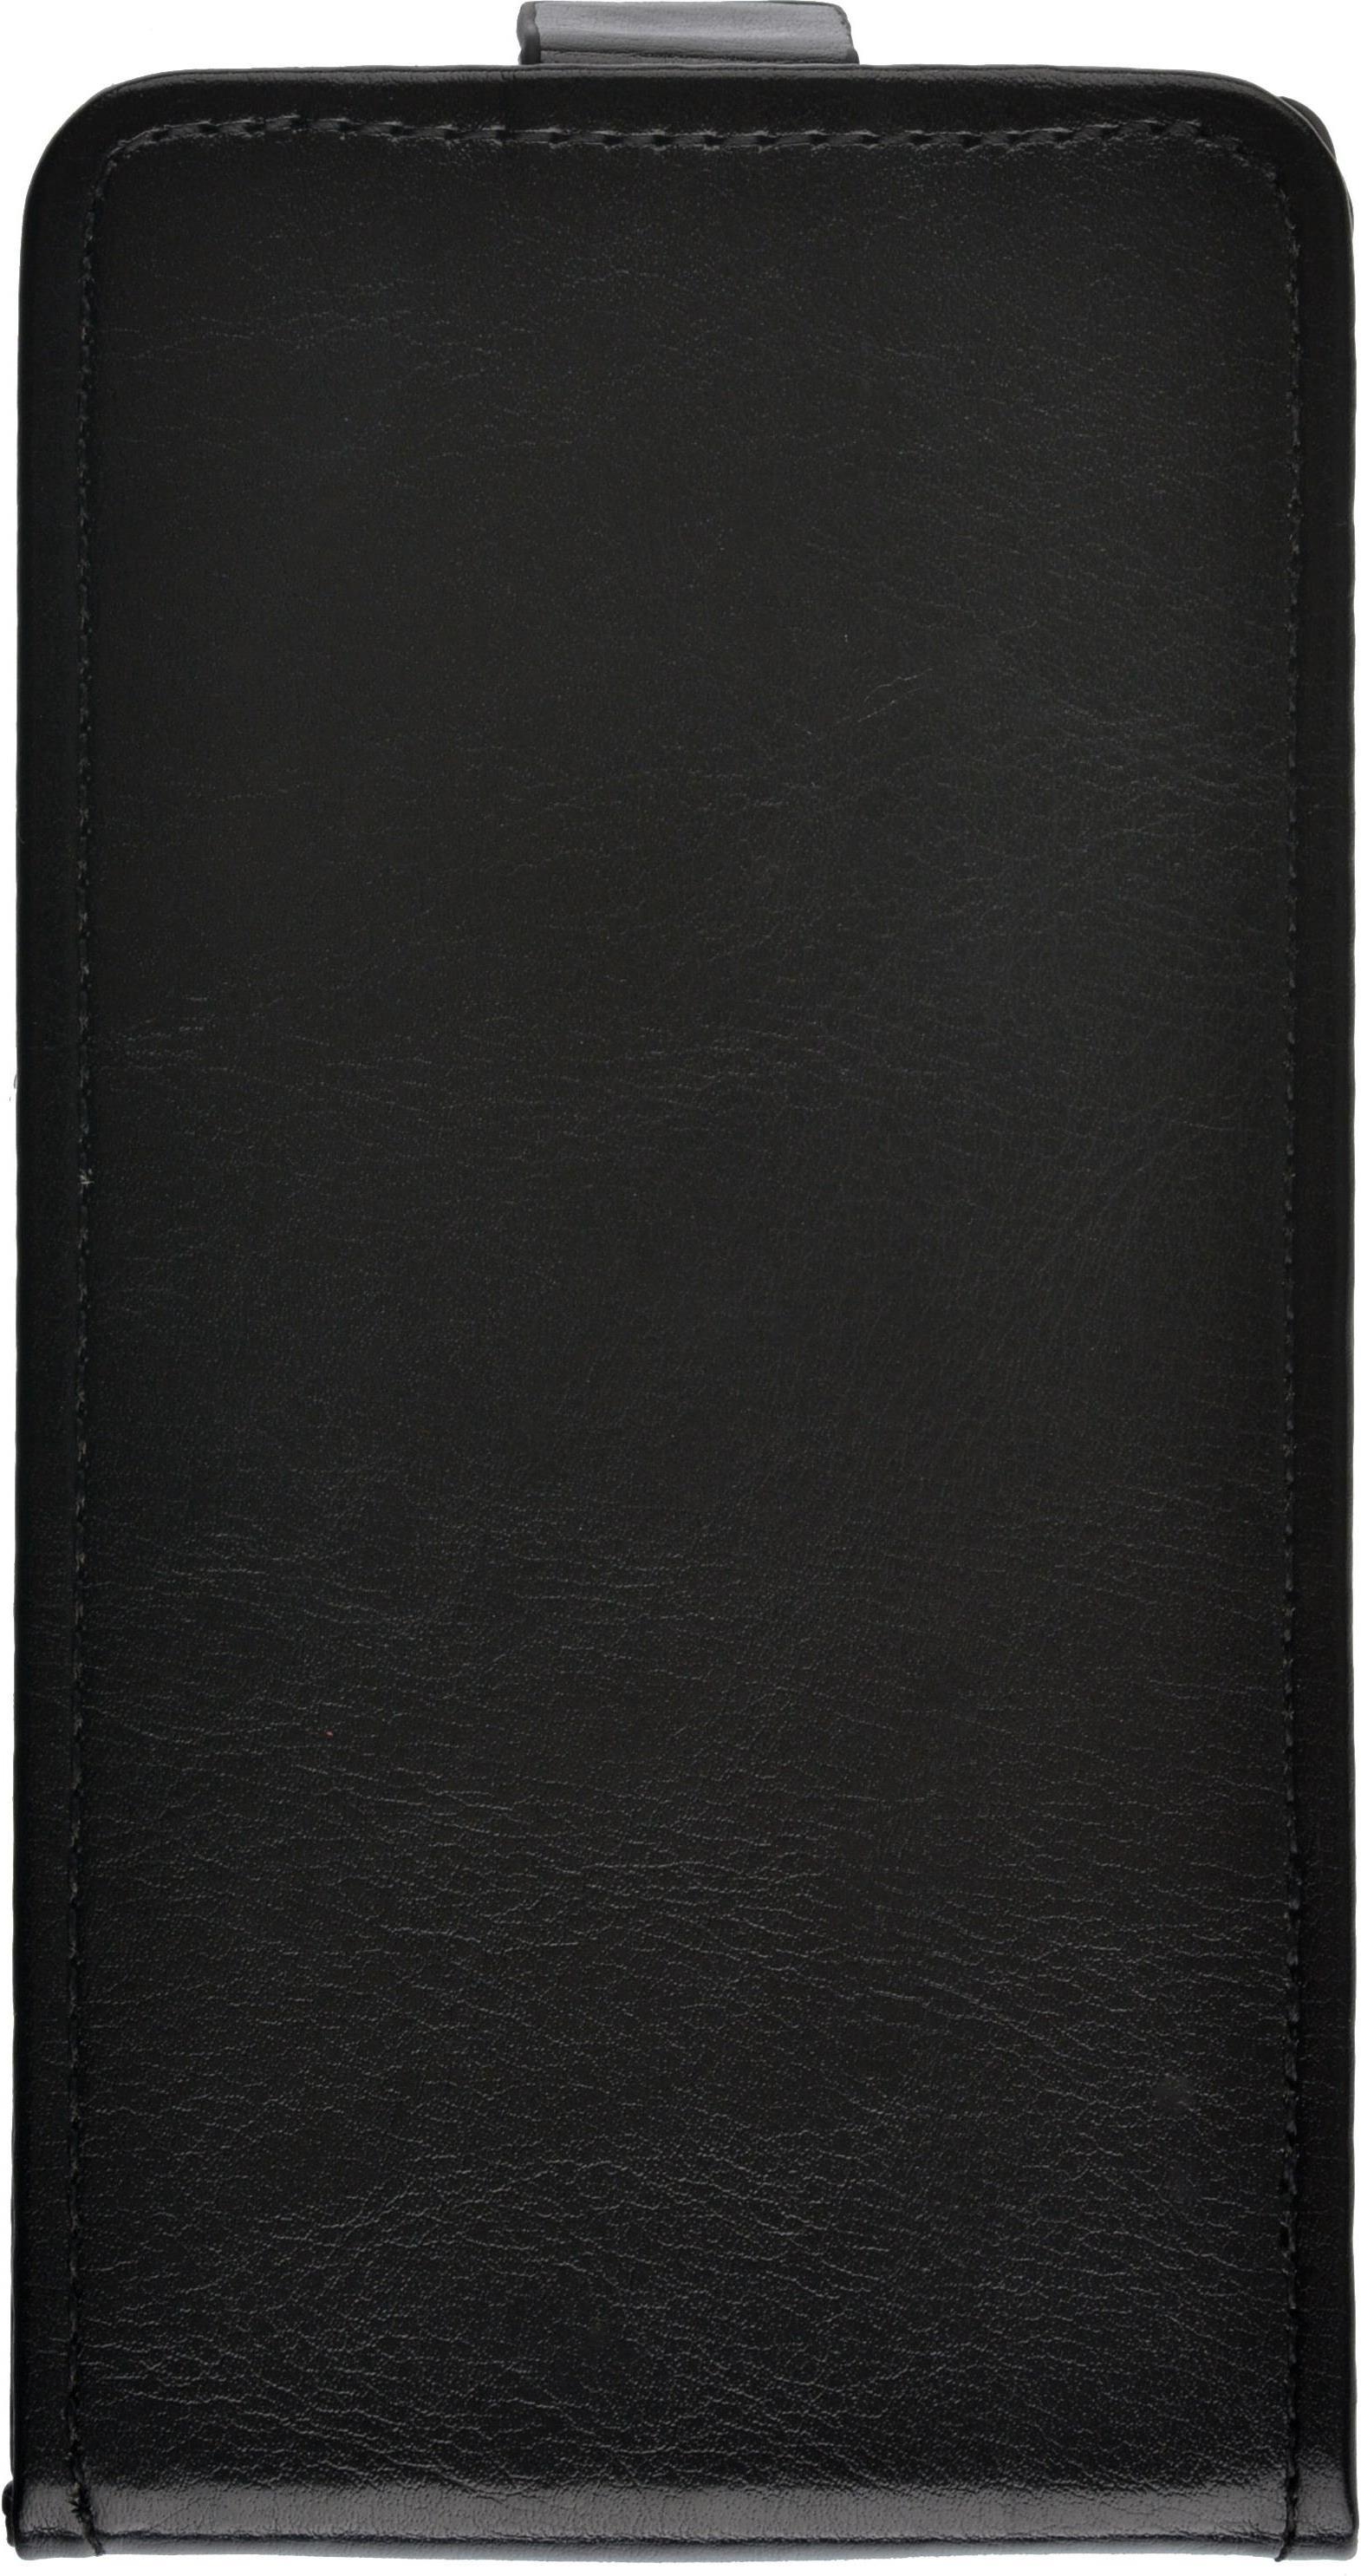 Чехол skinBOX для Lenovo P90, 2000000077741, черный чехол skinbox для lenovo s5000 4630042521483 черный